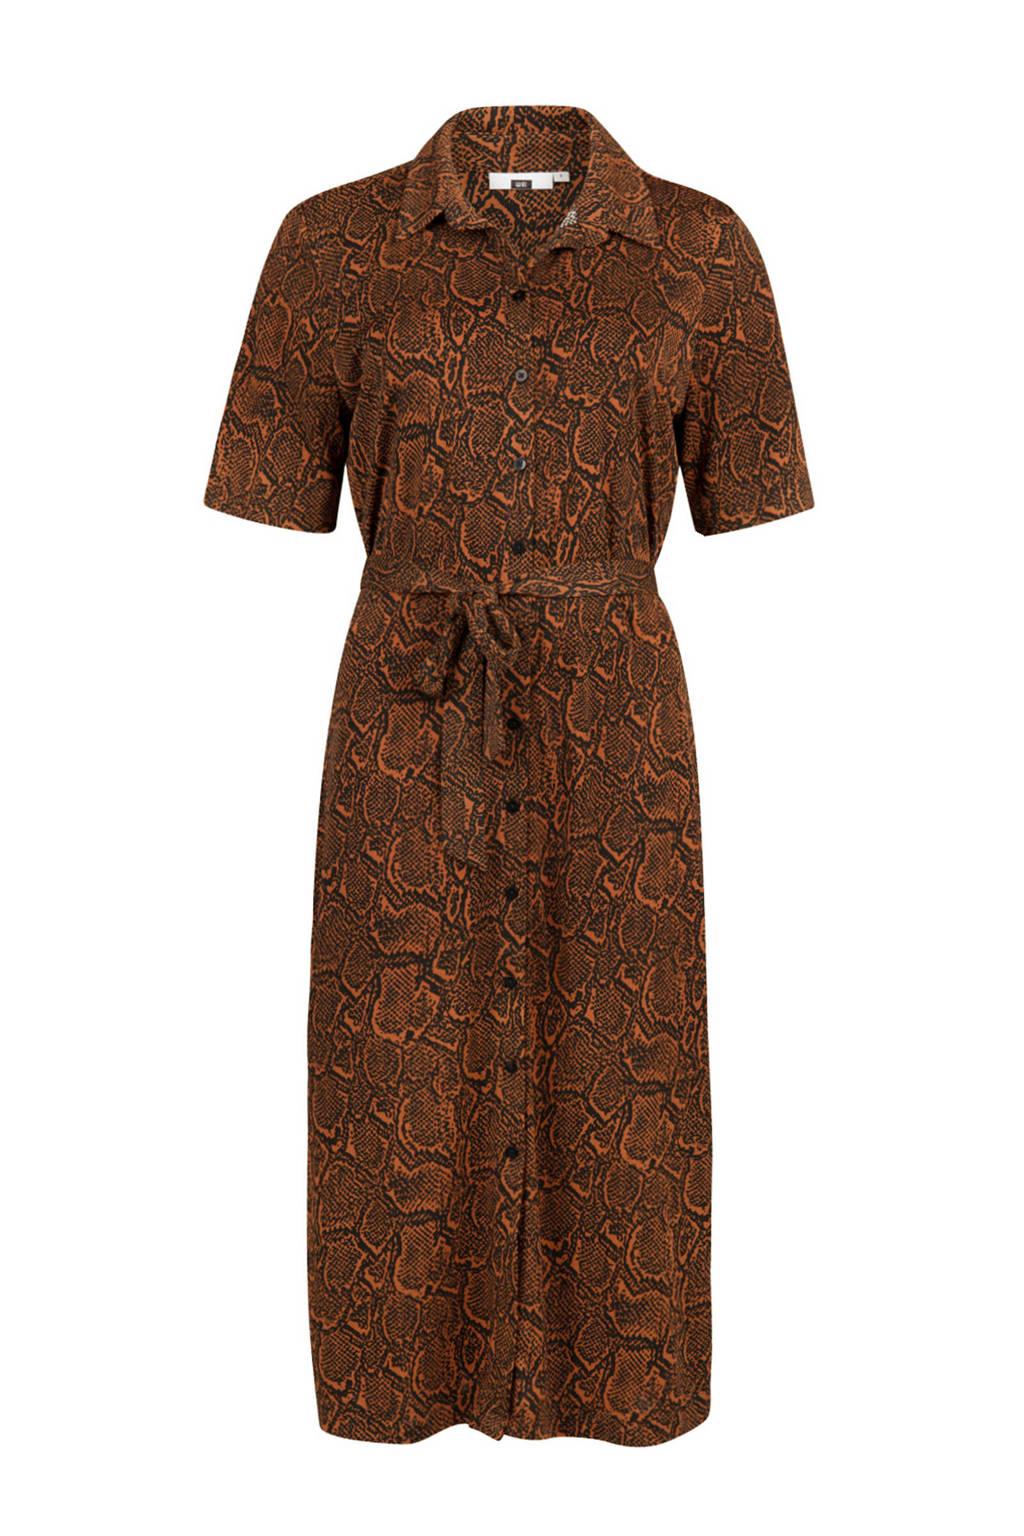 WE Fashion blousejurk met slangenprint, Bruin